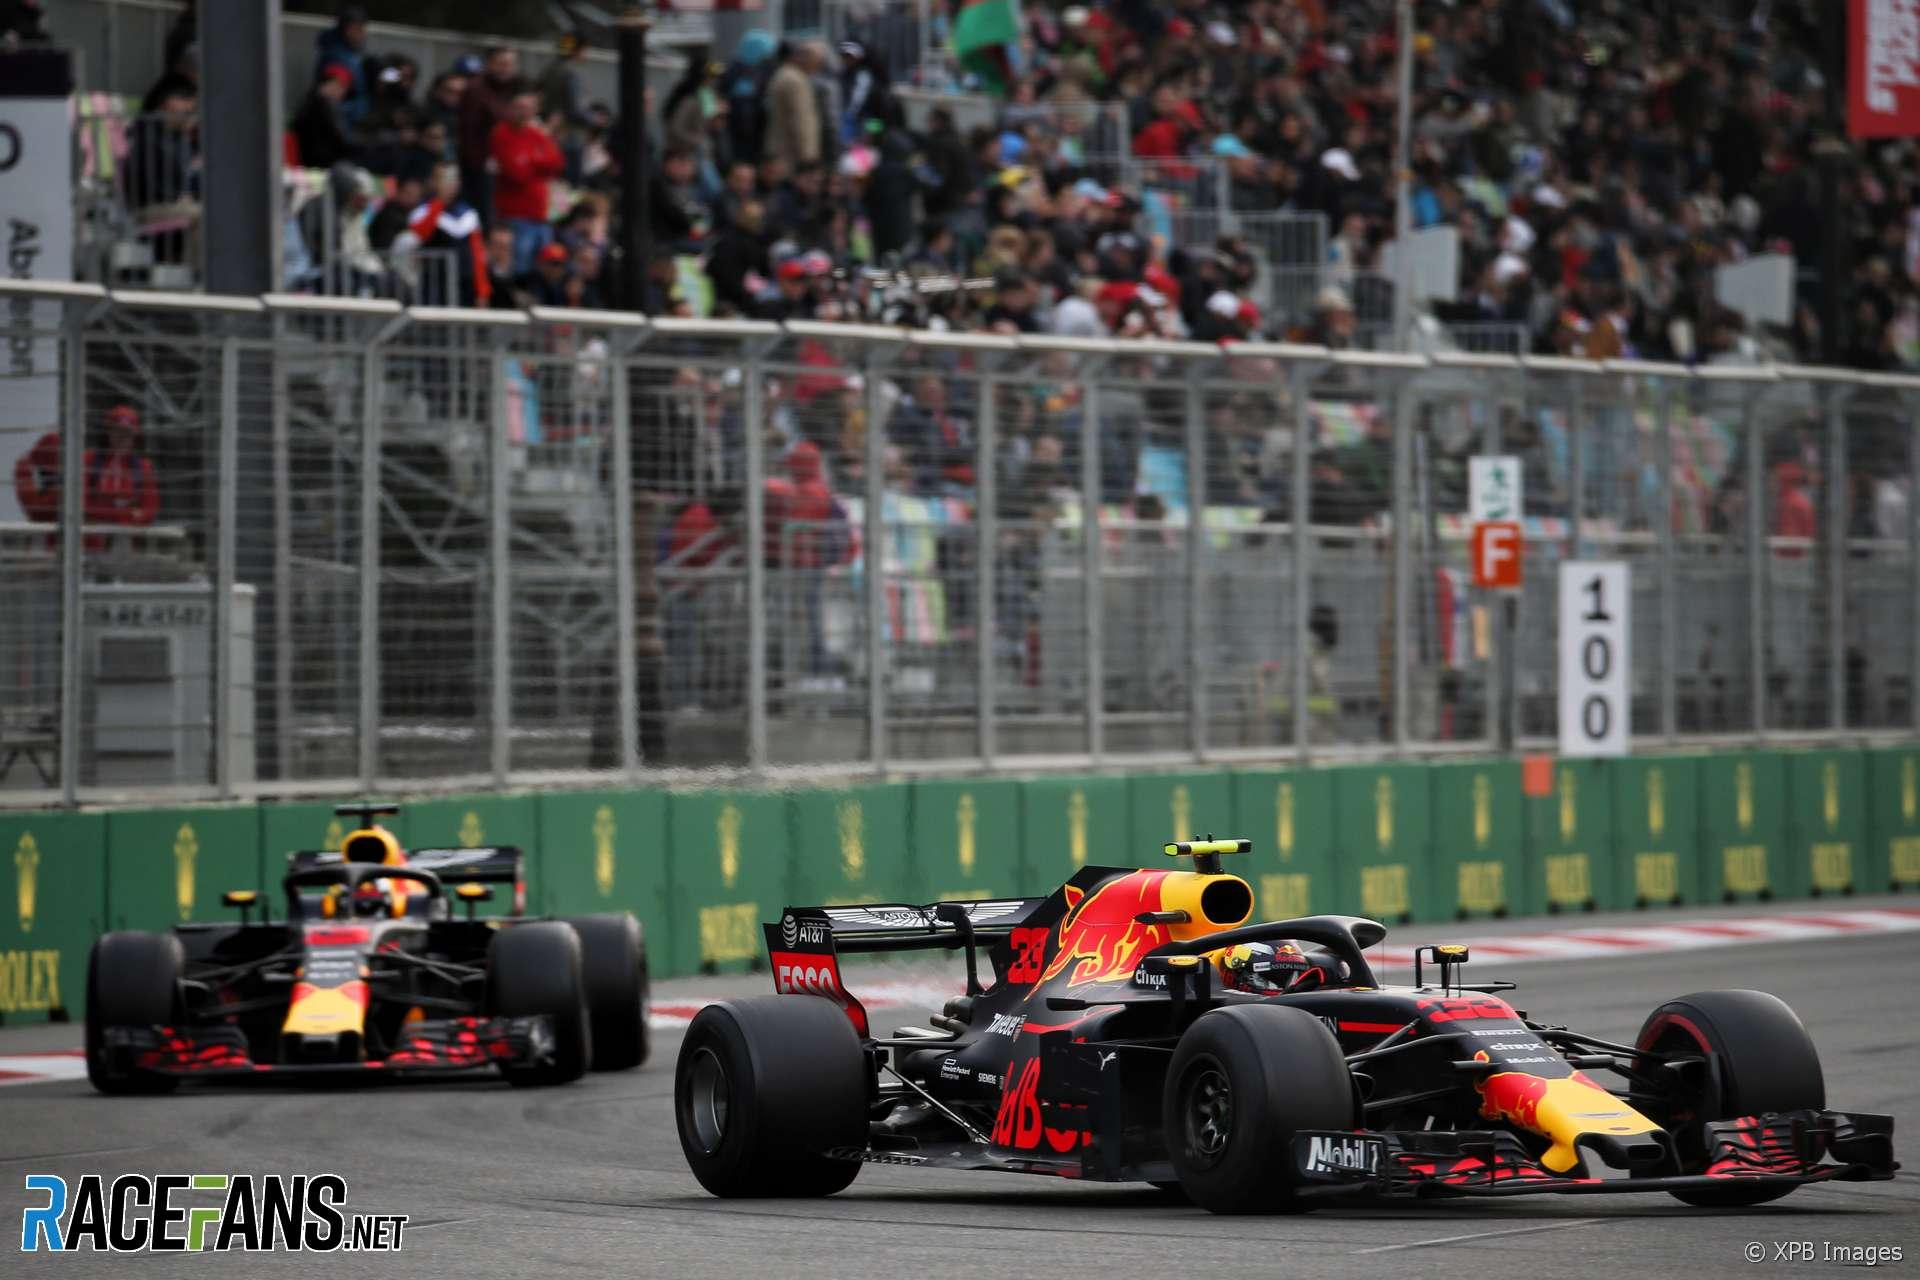 Daniel Ricciardo, Max Verstappen, Red Bull, Baku City Circuit, 2018